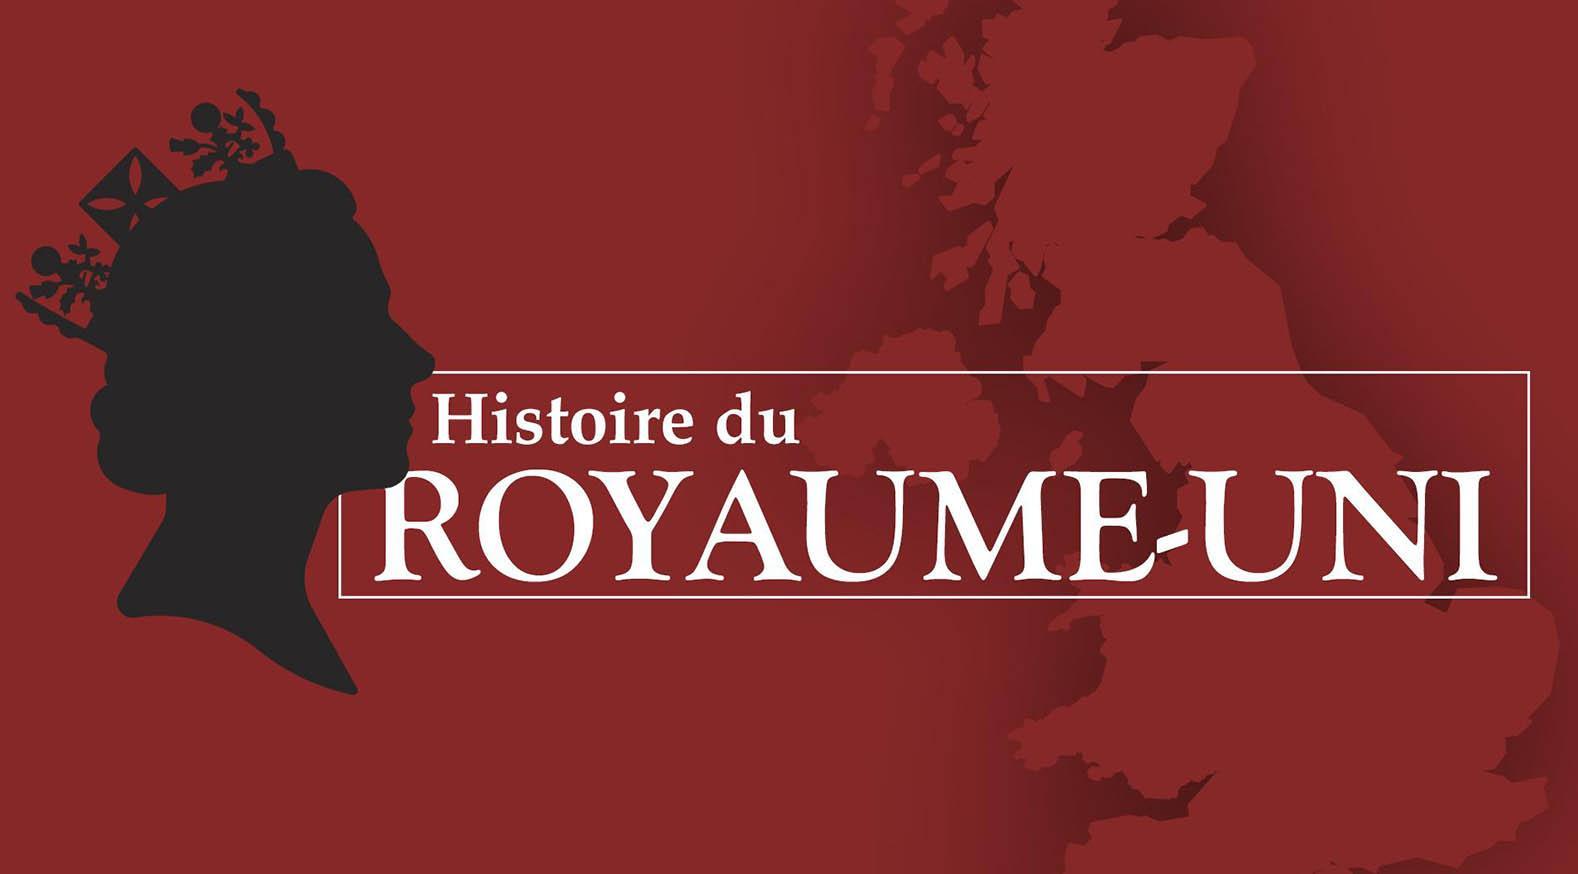 Histoire du royaume uni 1